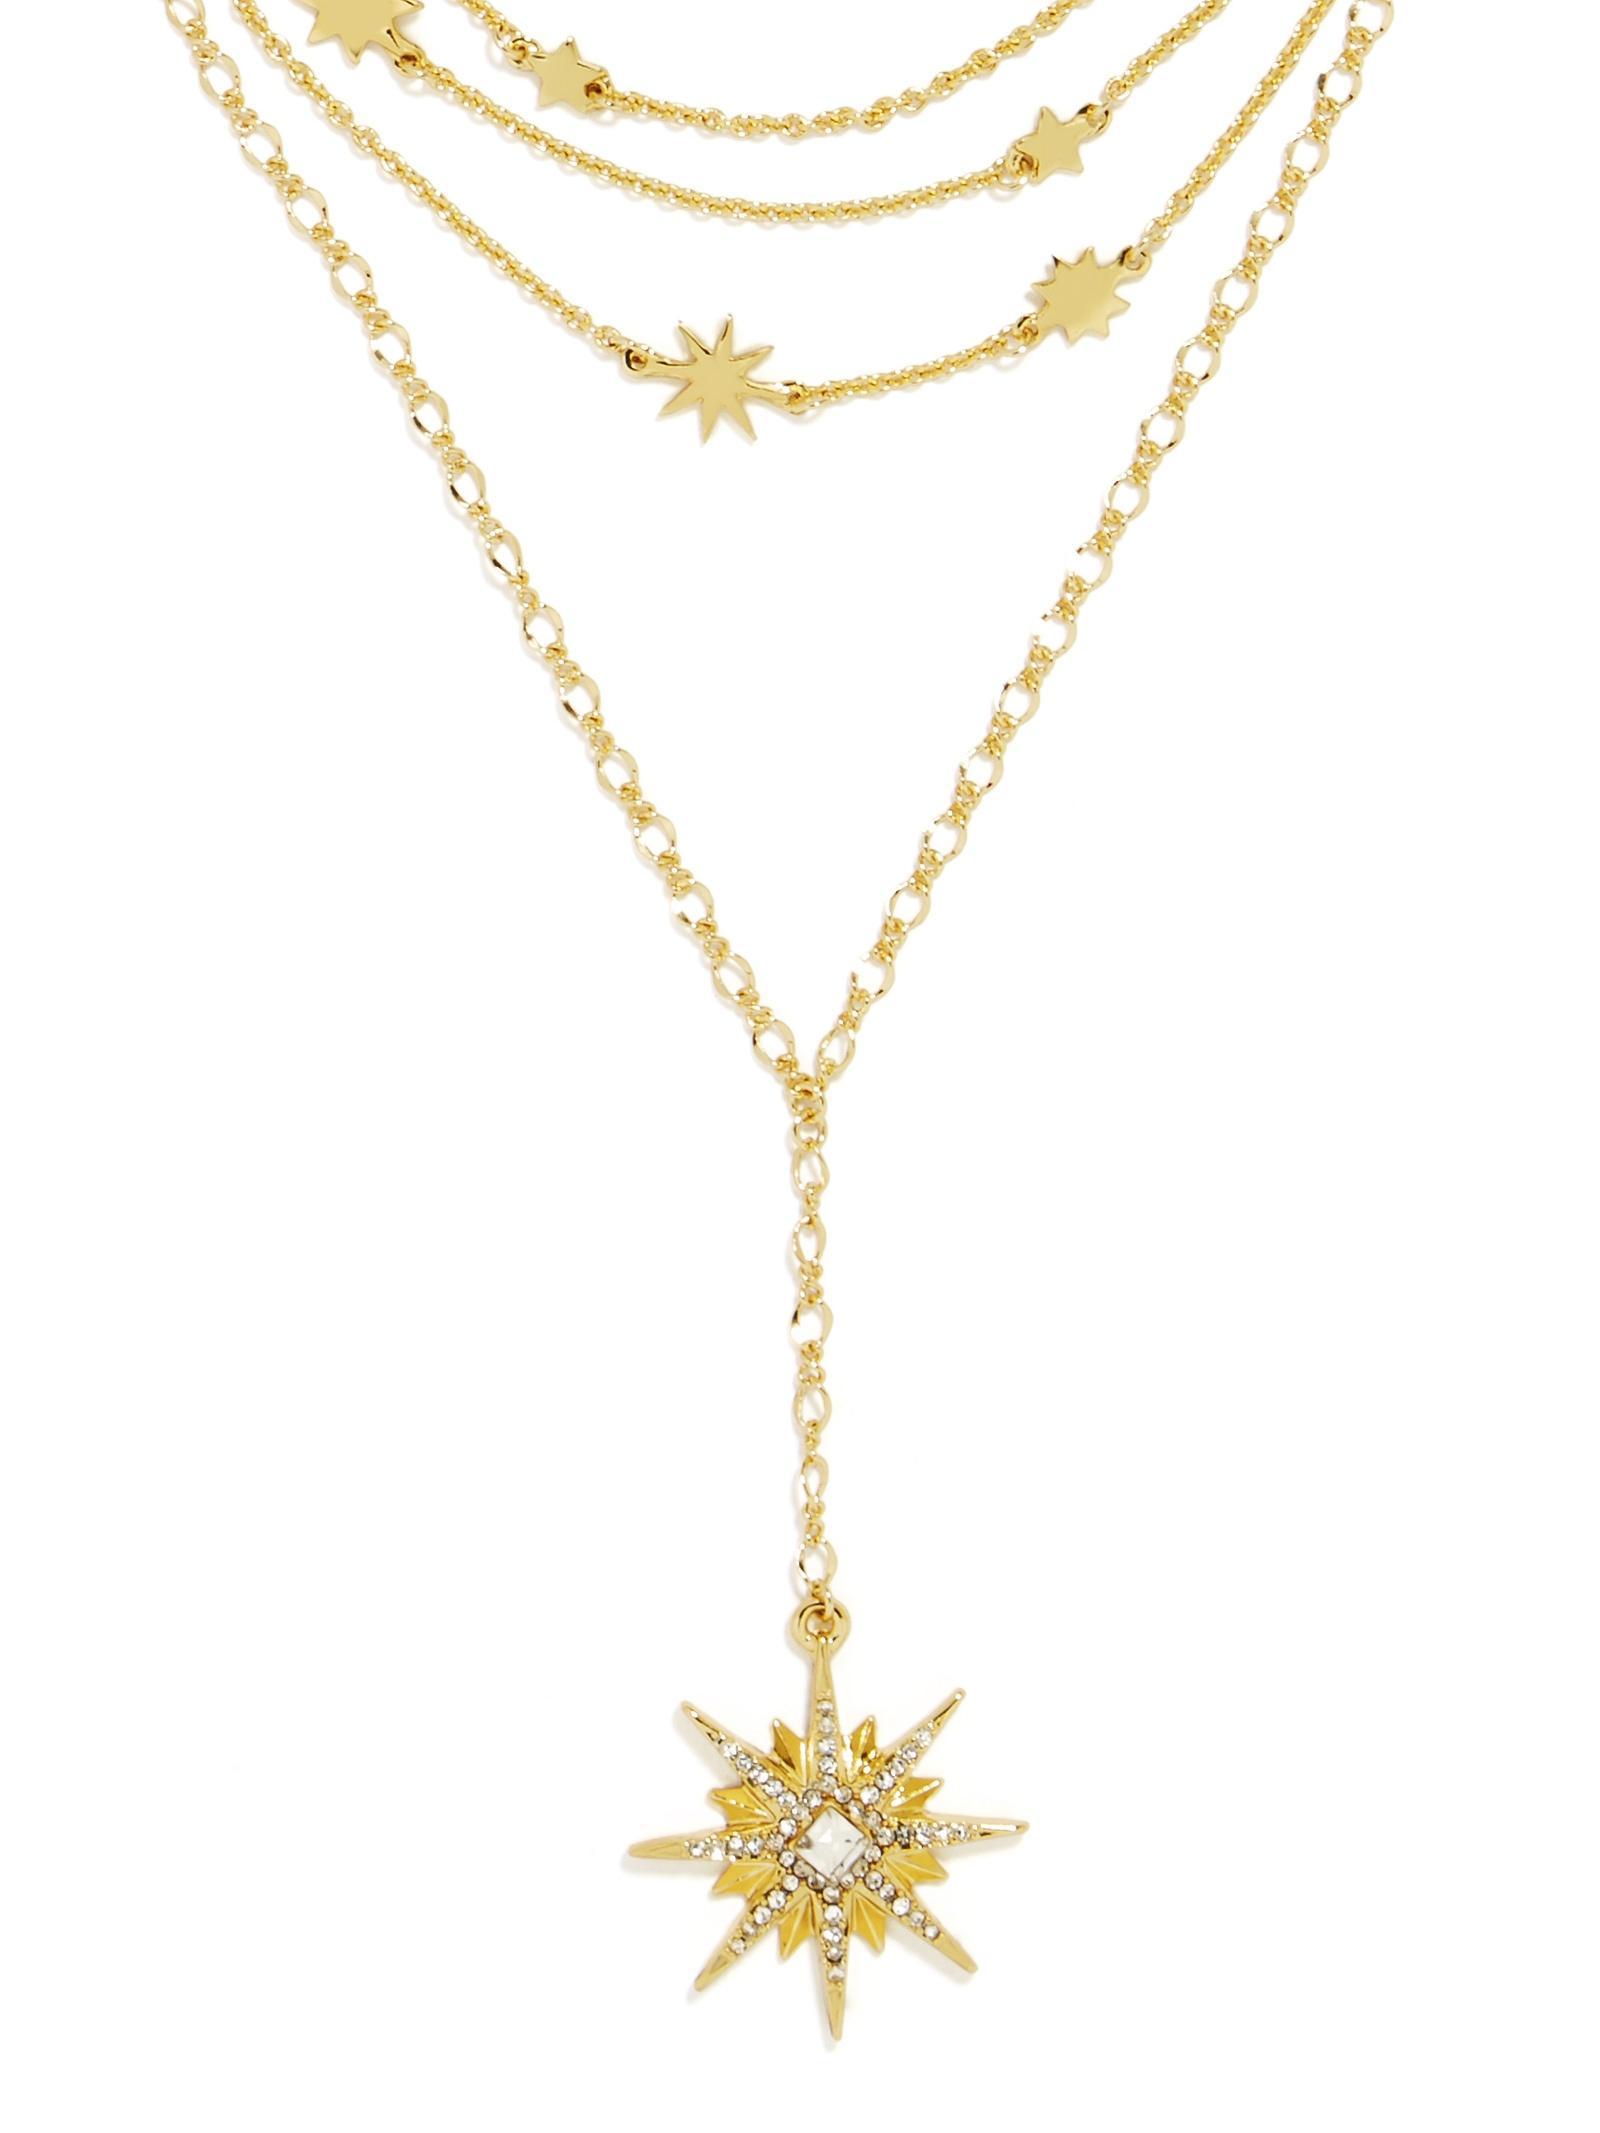 BaubleBar Equinox Choker Necklace in Gold (Metallic)